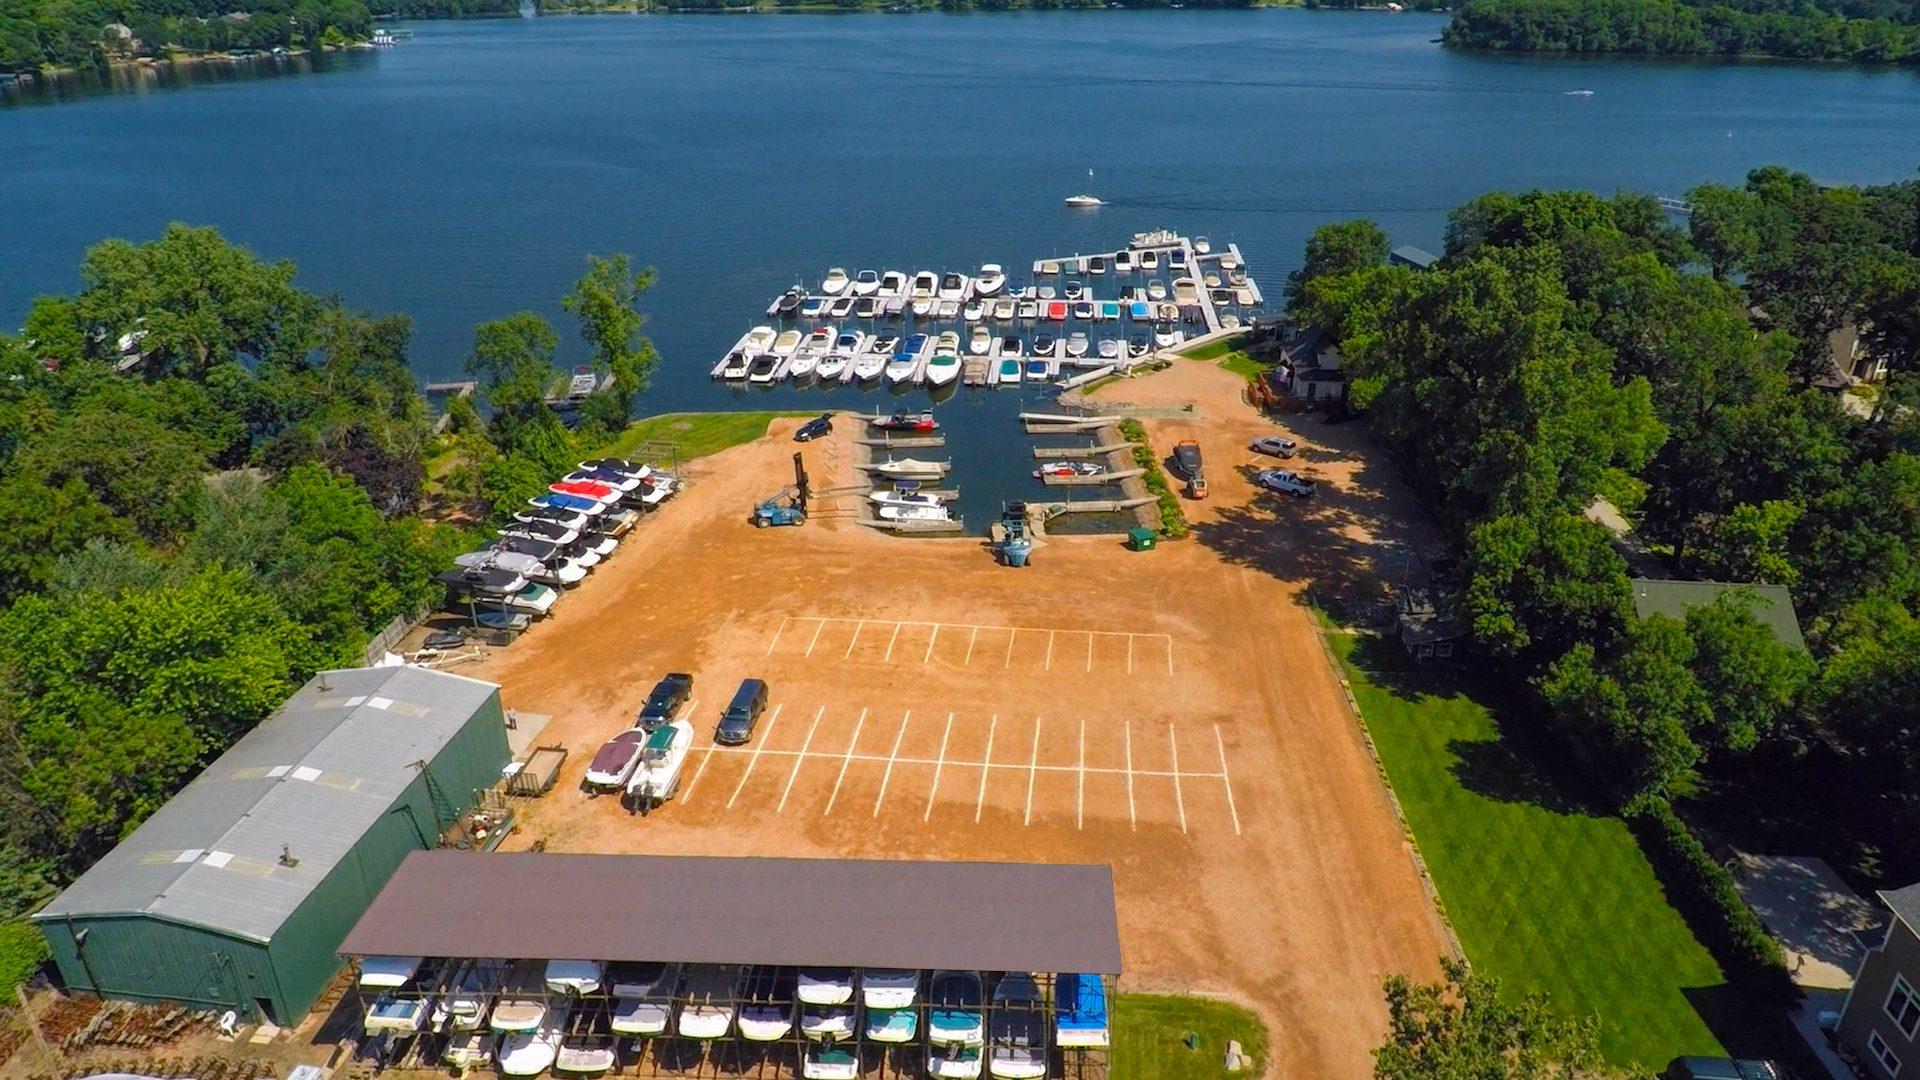 North Shore Marina